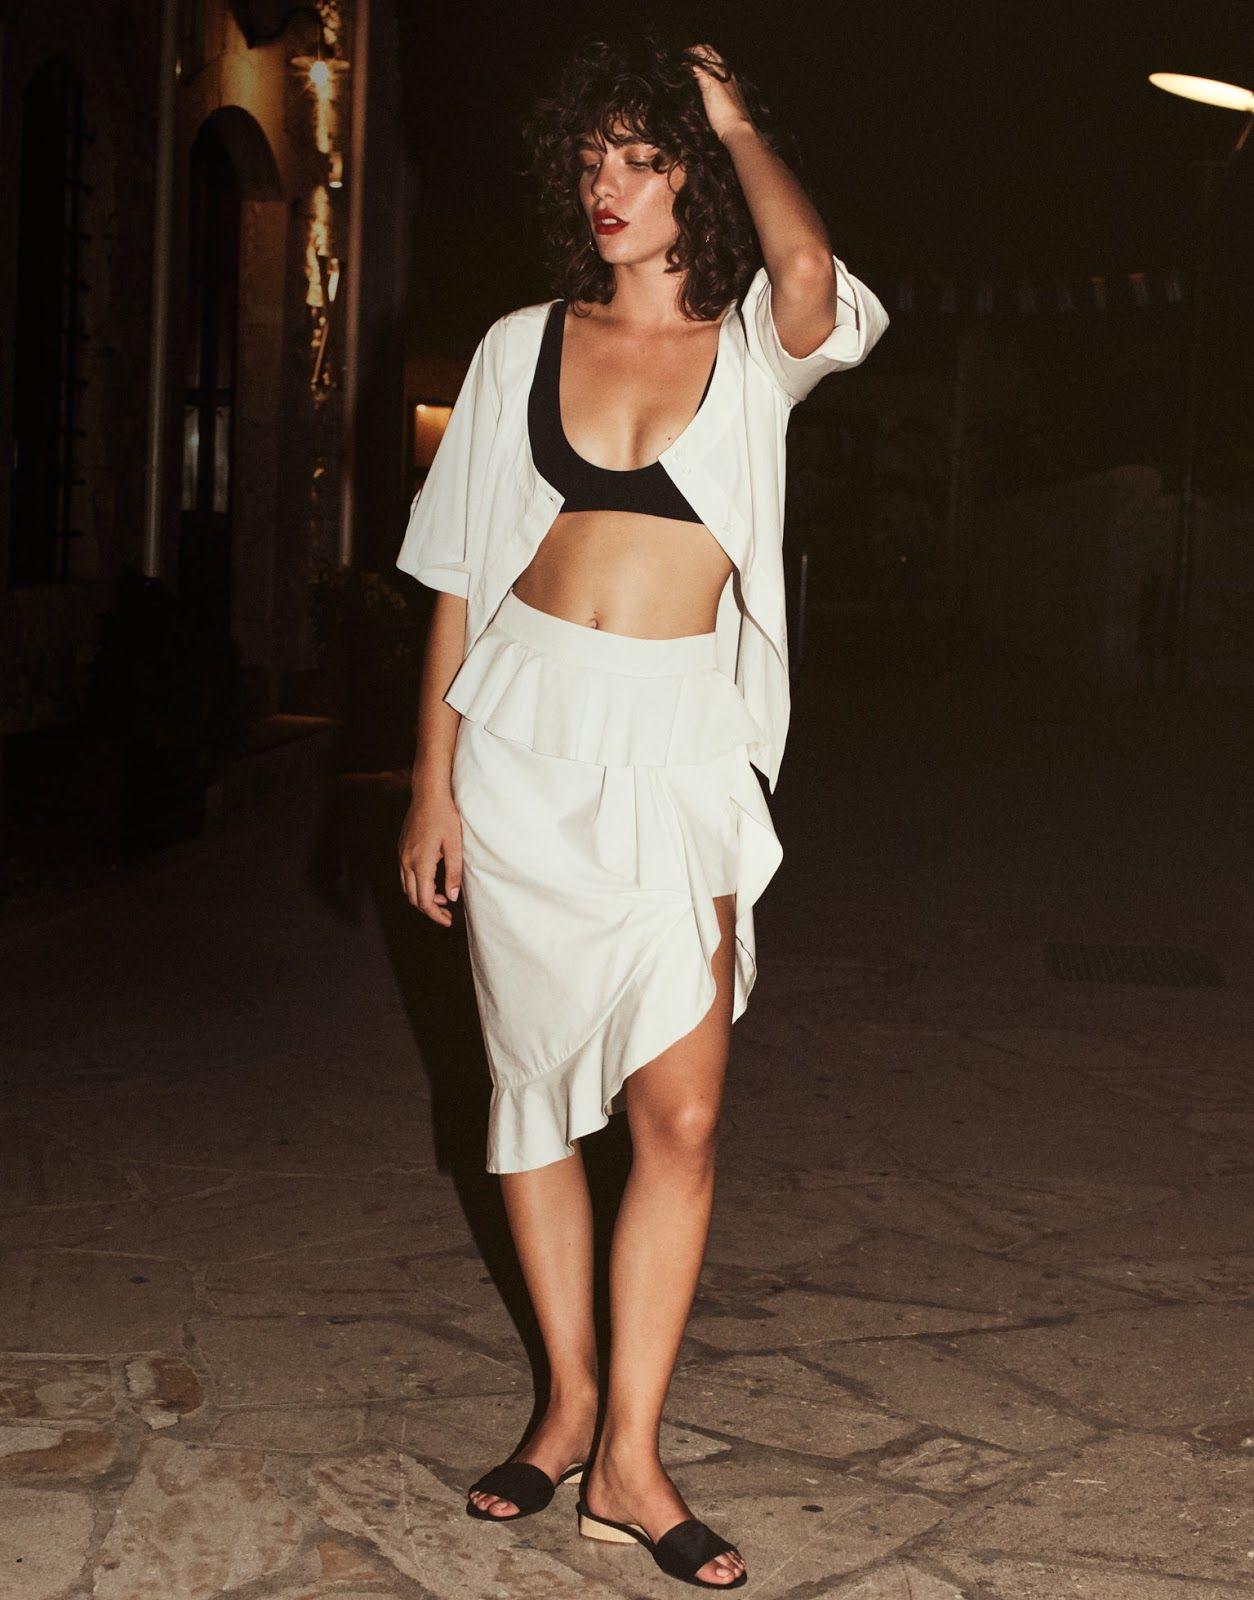 Bikini Steffy Argelich nude photos 2019